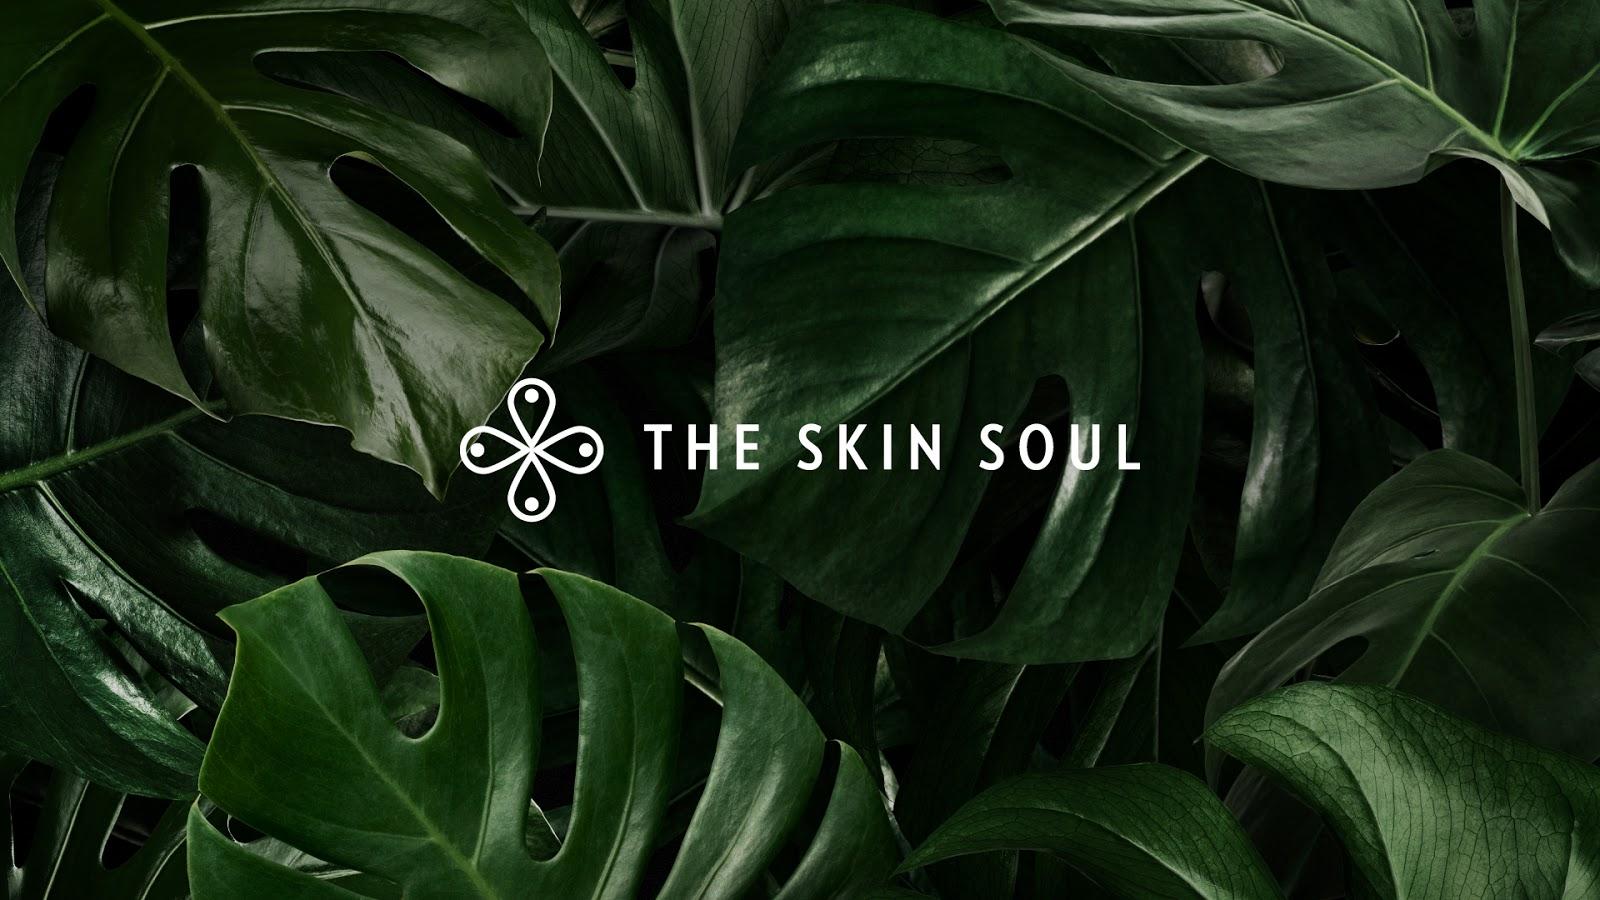 The Skin Soul